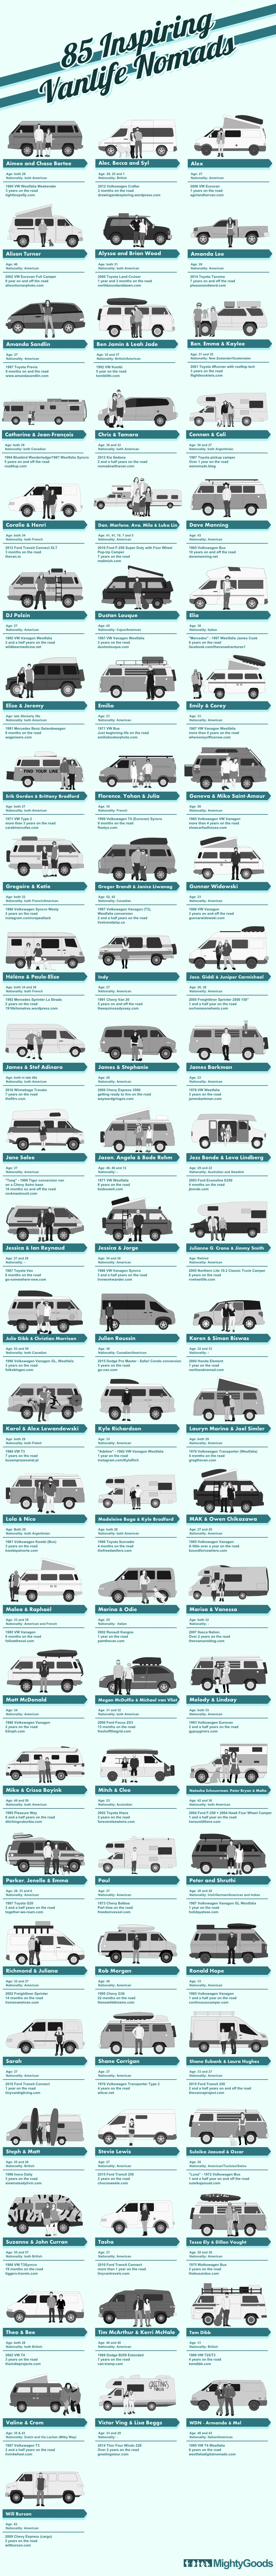 vanlife-nomads